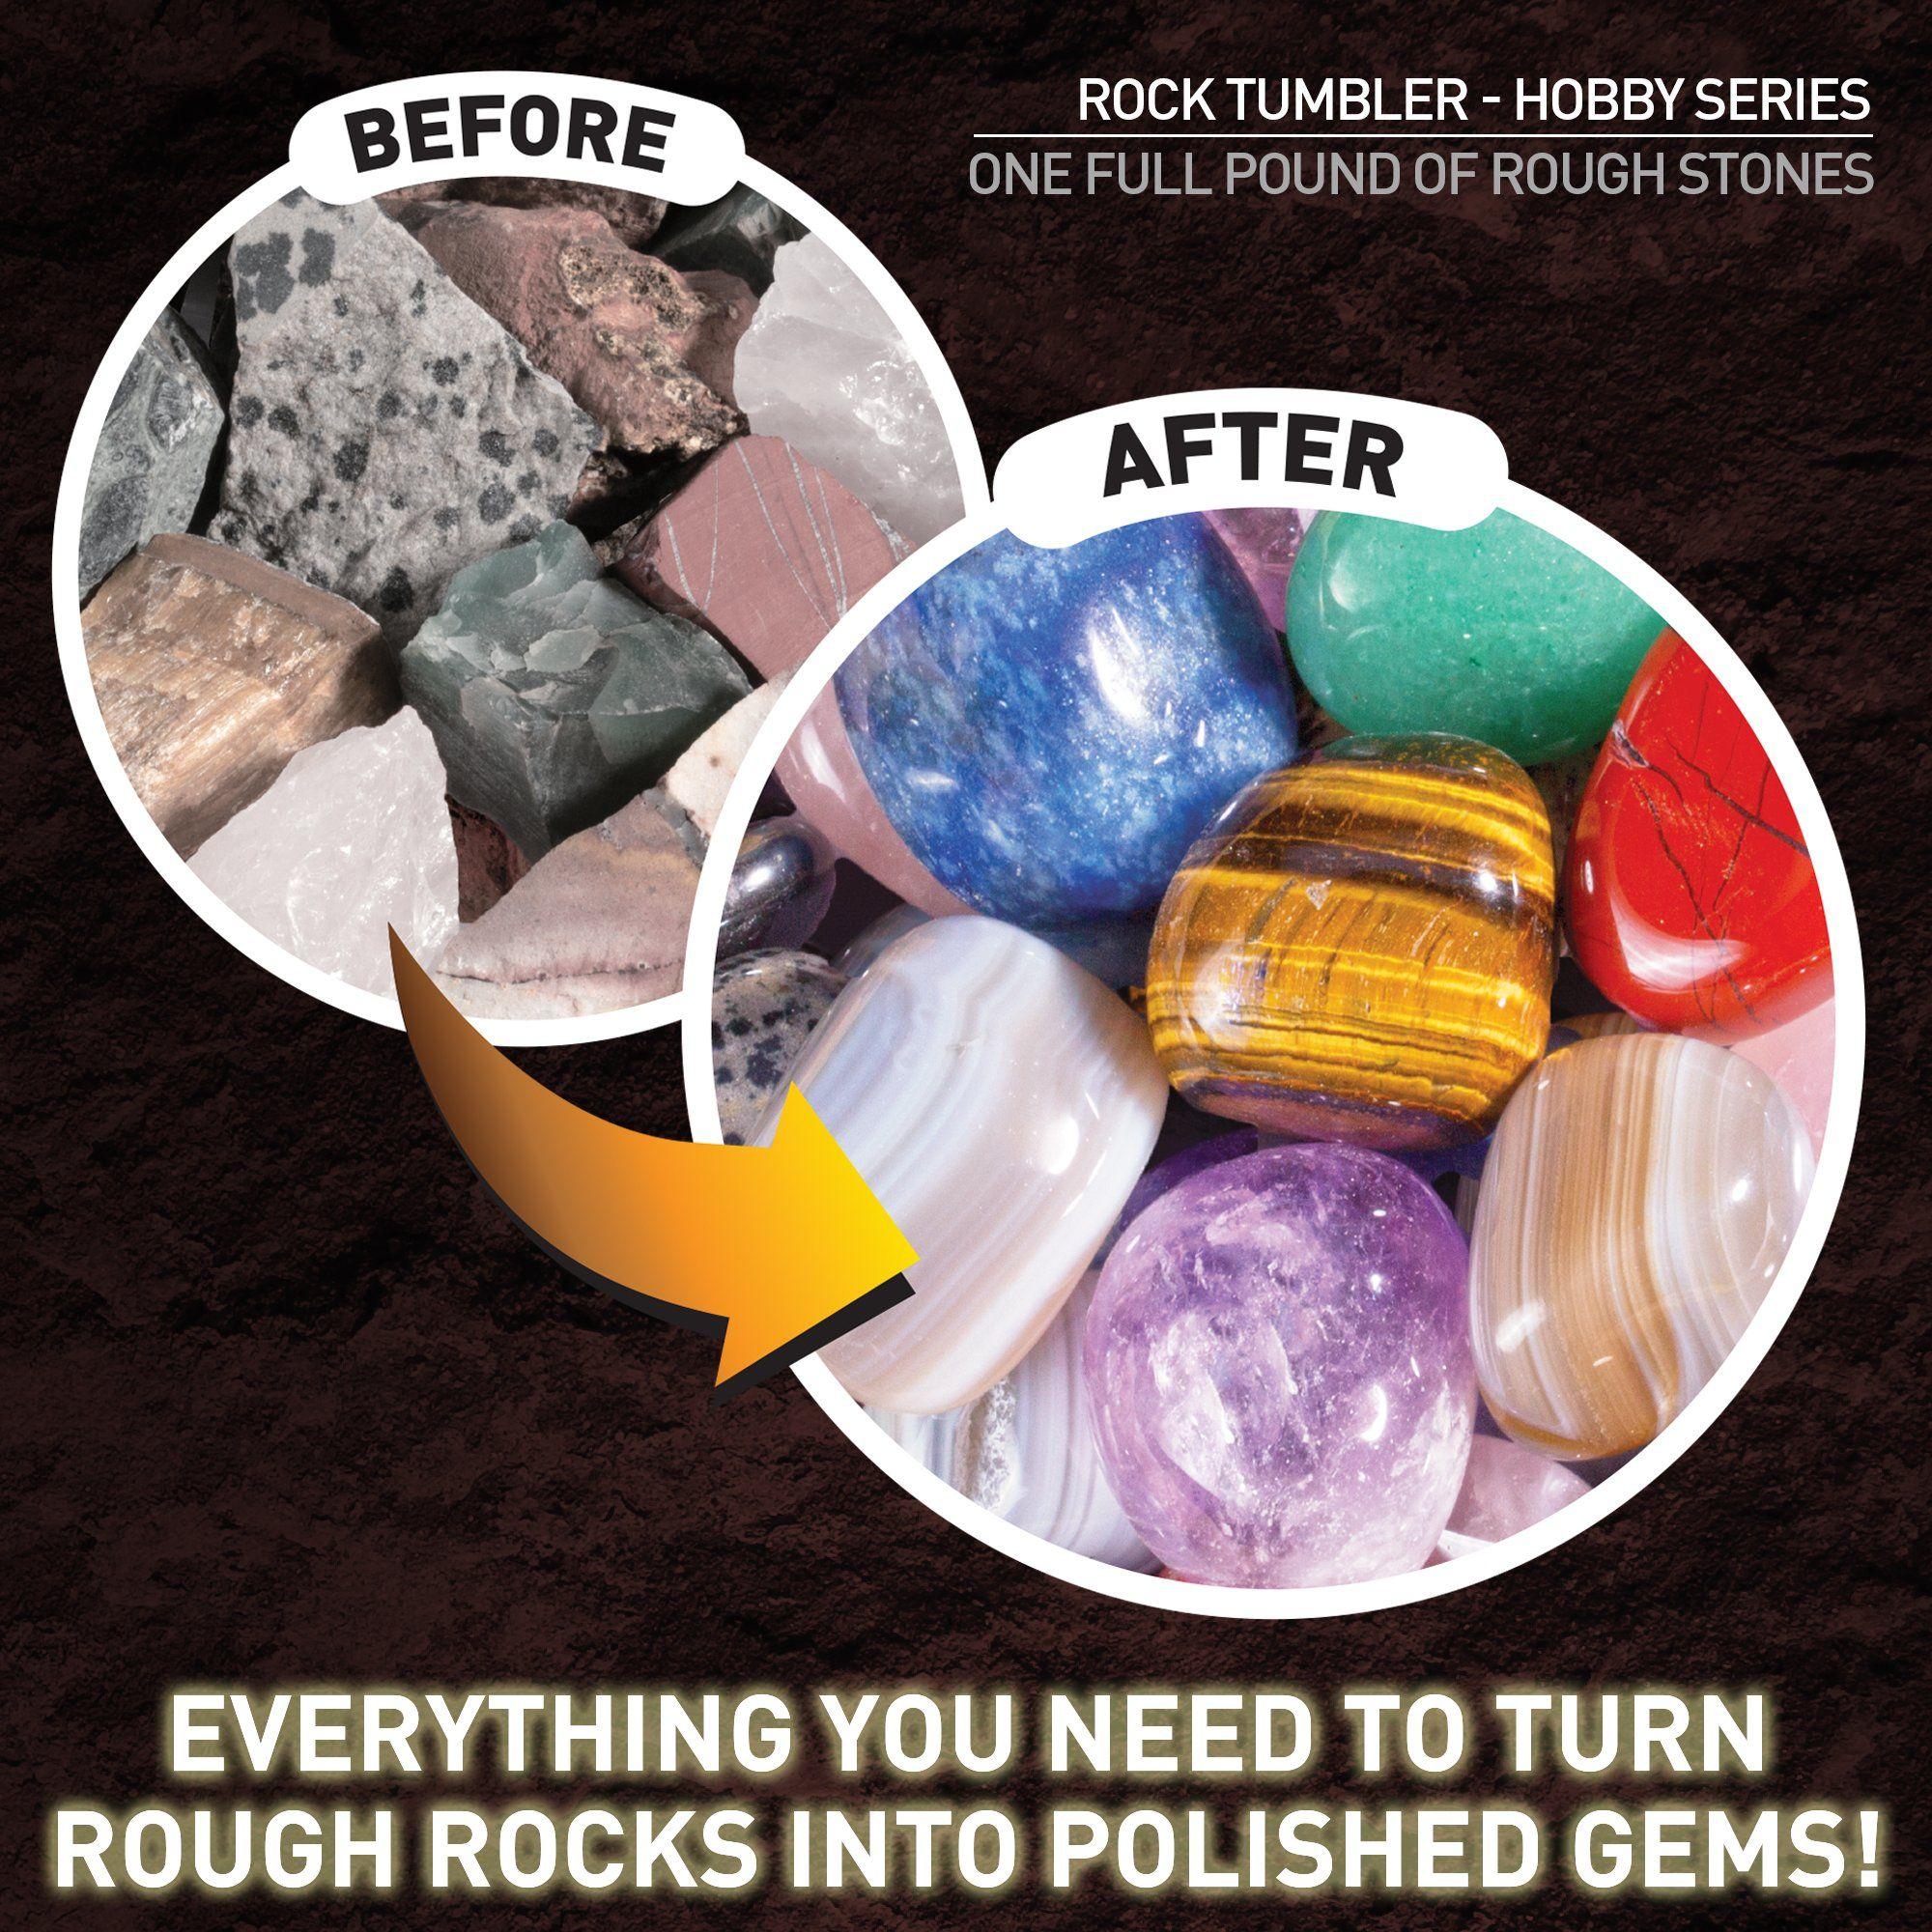 National Geographic Hobby Rock Tumbler Kit Rotary Rock Tumbler